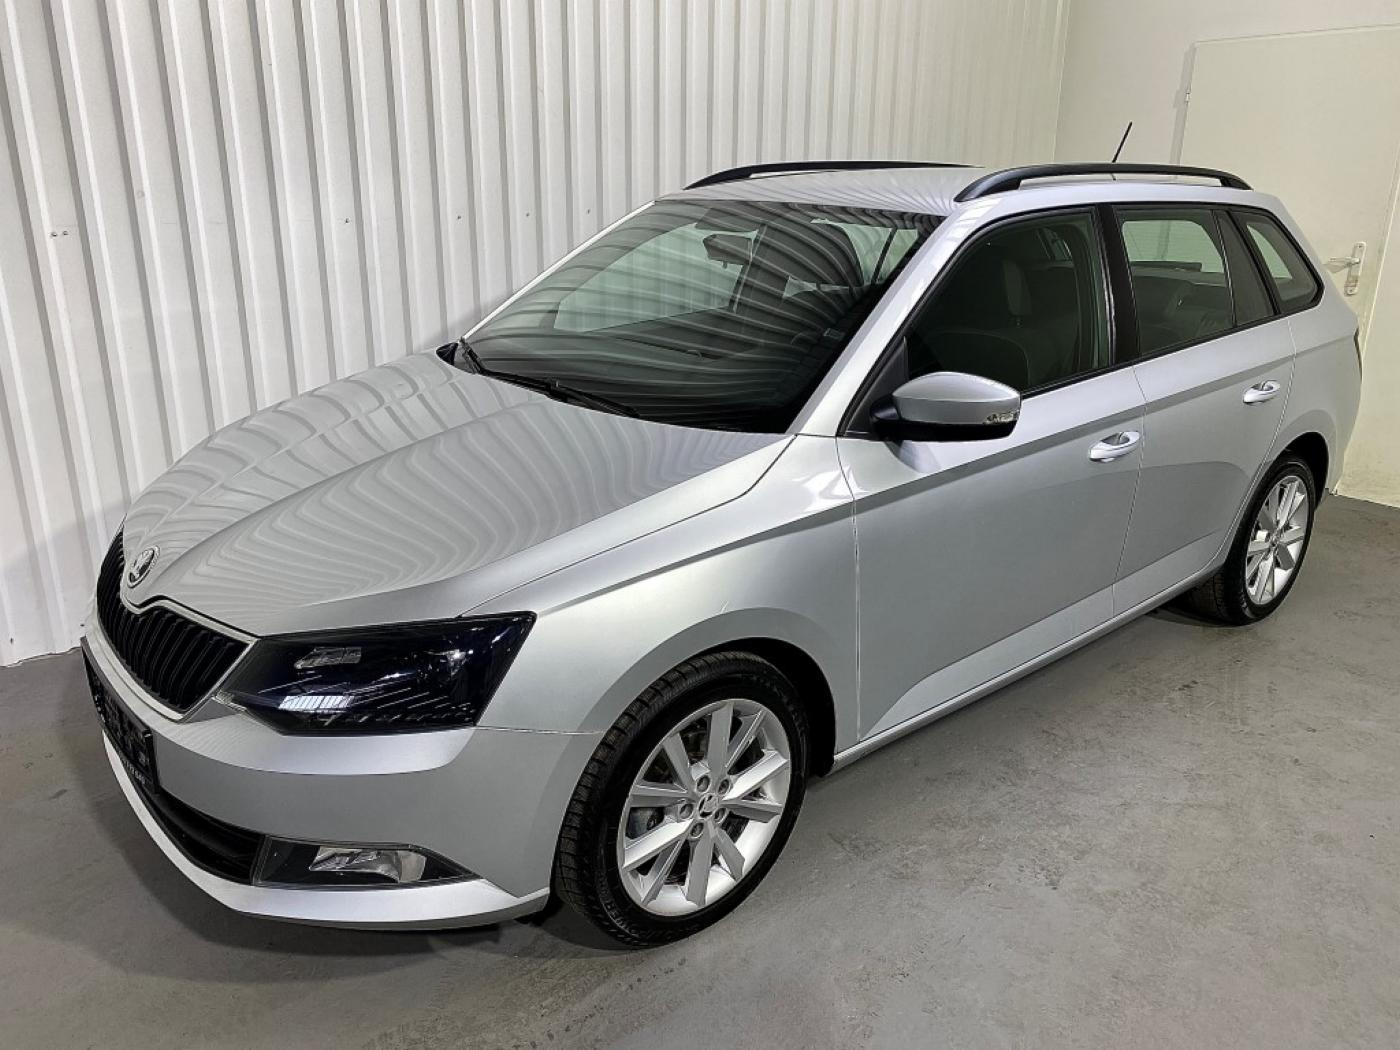 Škoda Fabia 1.0 MPI + LPG kombi